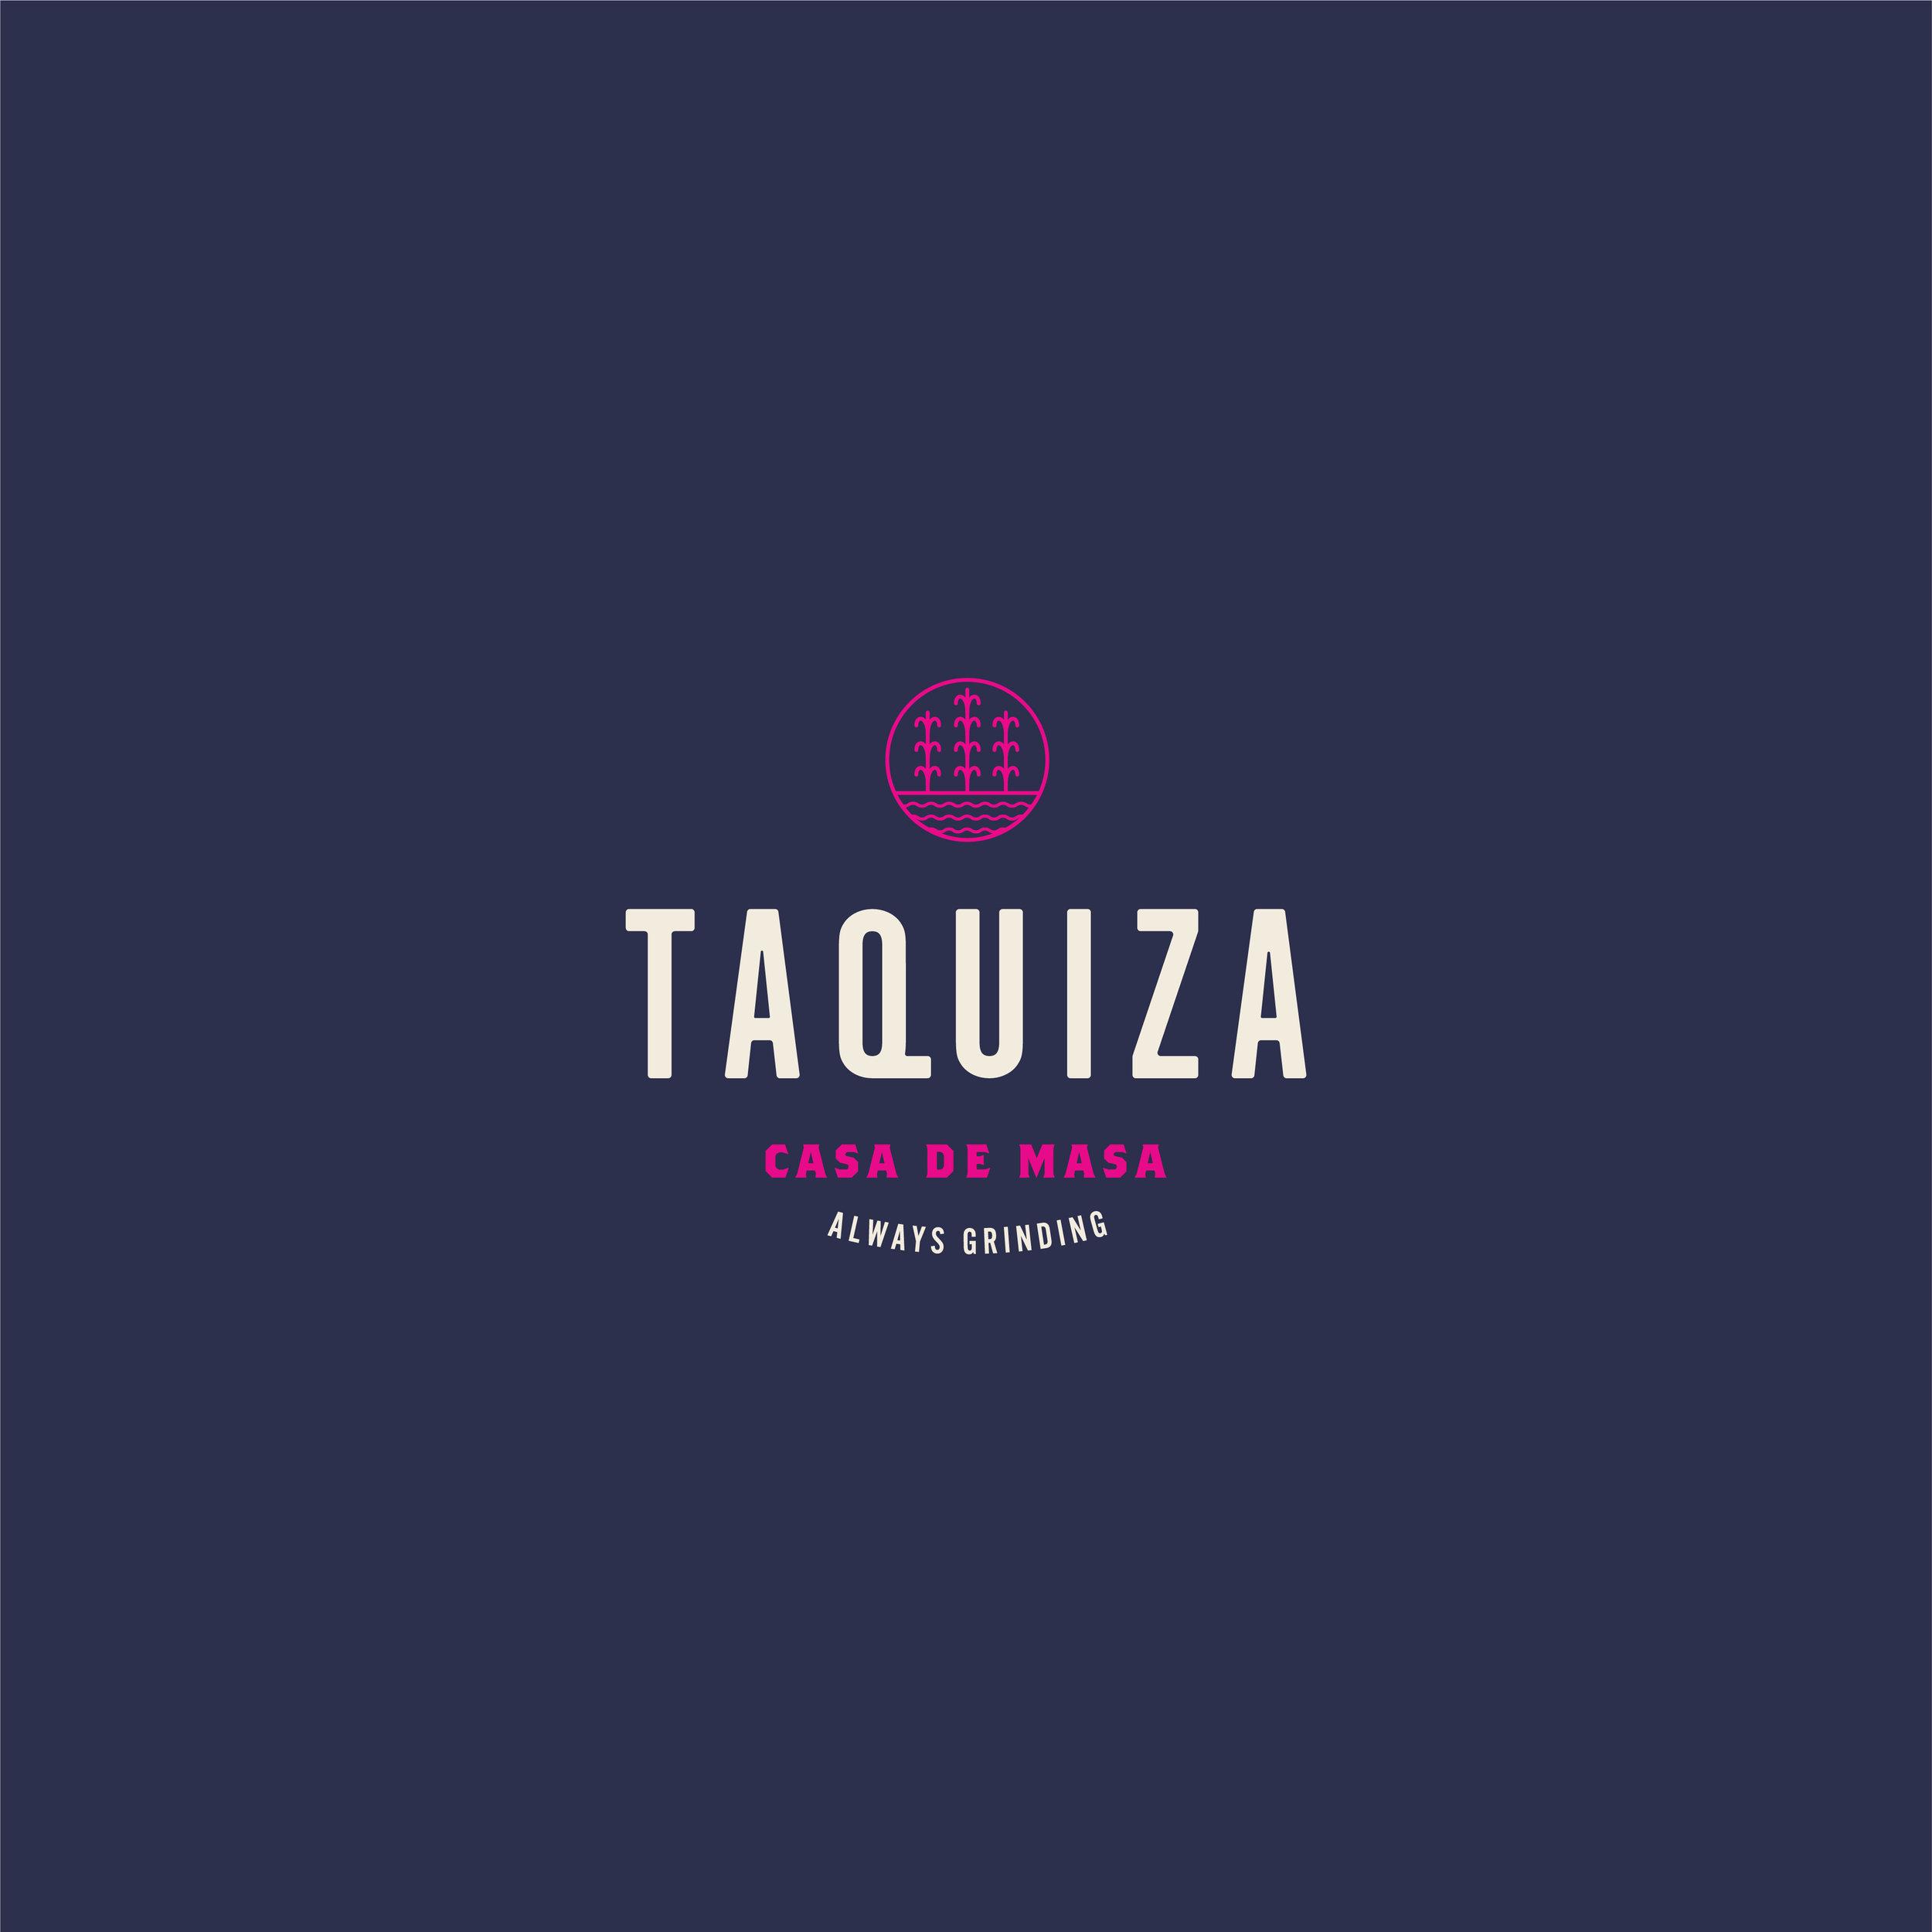 omit-studios-miami-taquiza-tacos-branding-12.jpg